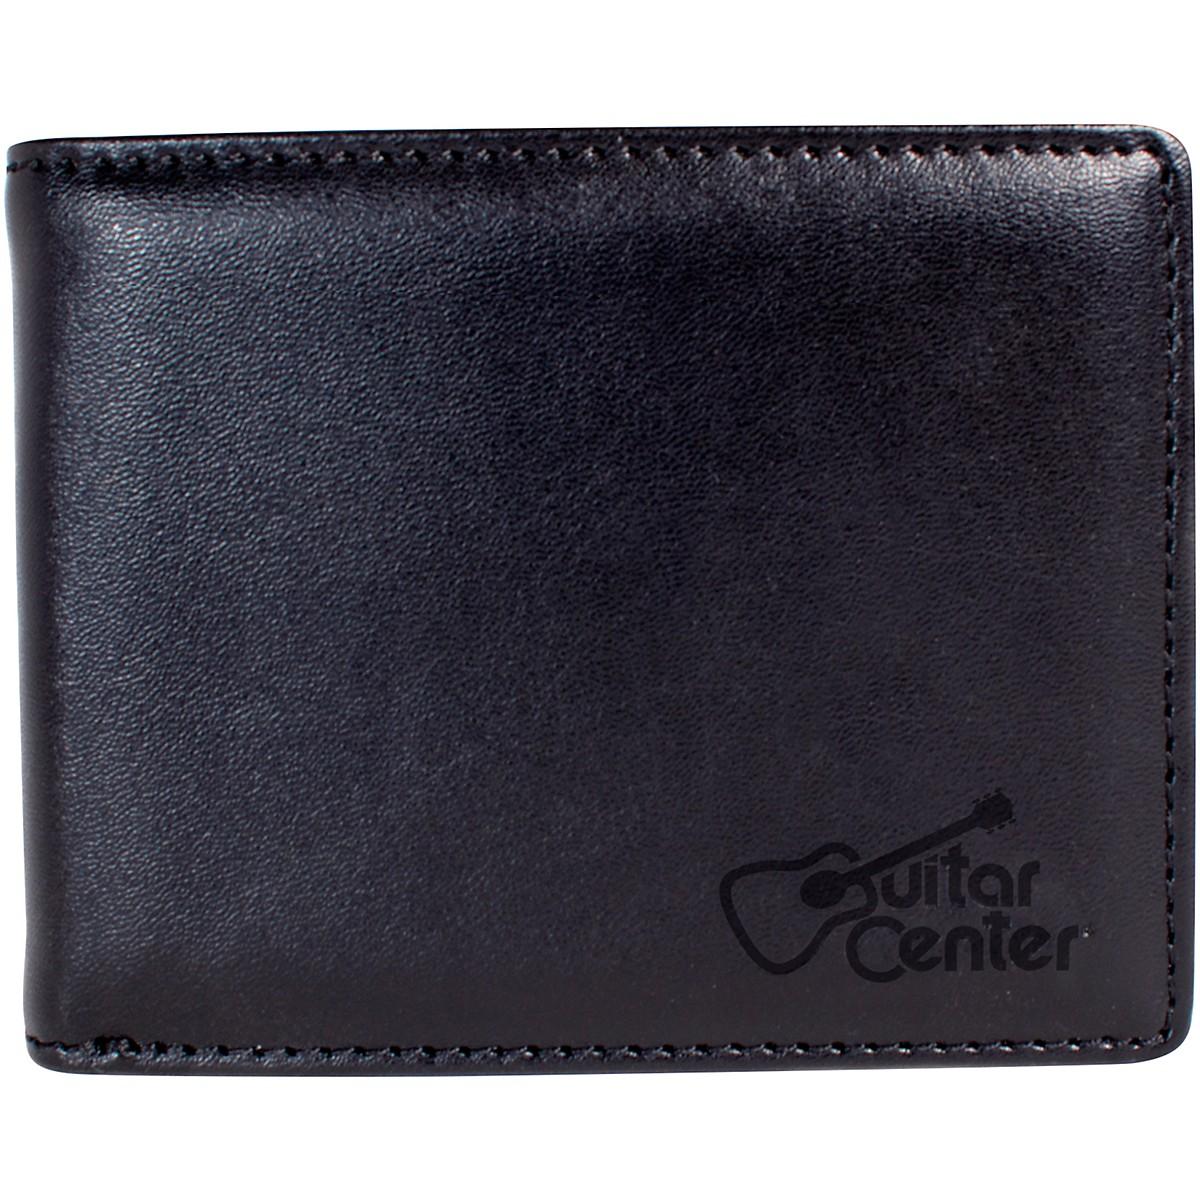 Guitar Center Leather Pick Wallet - Black